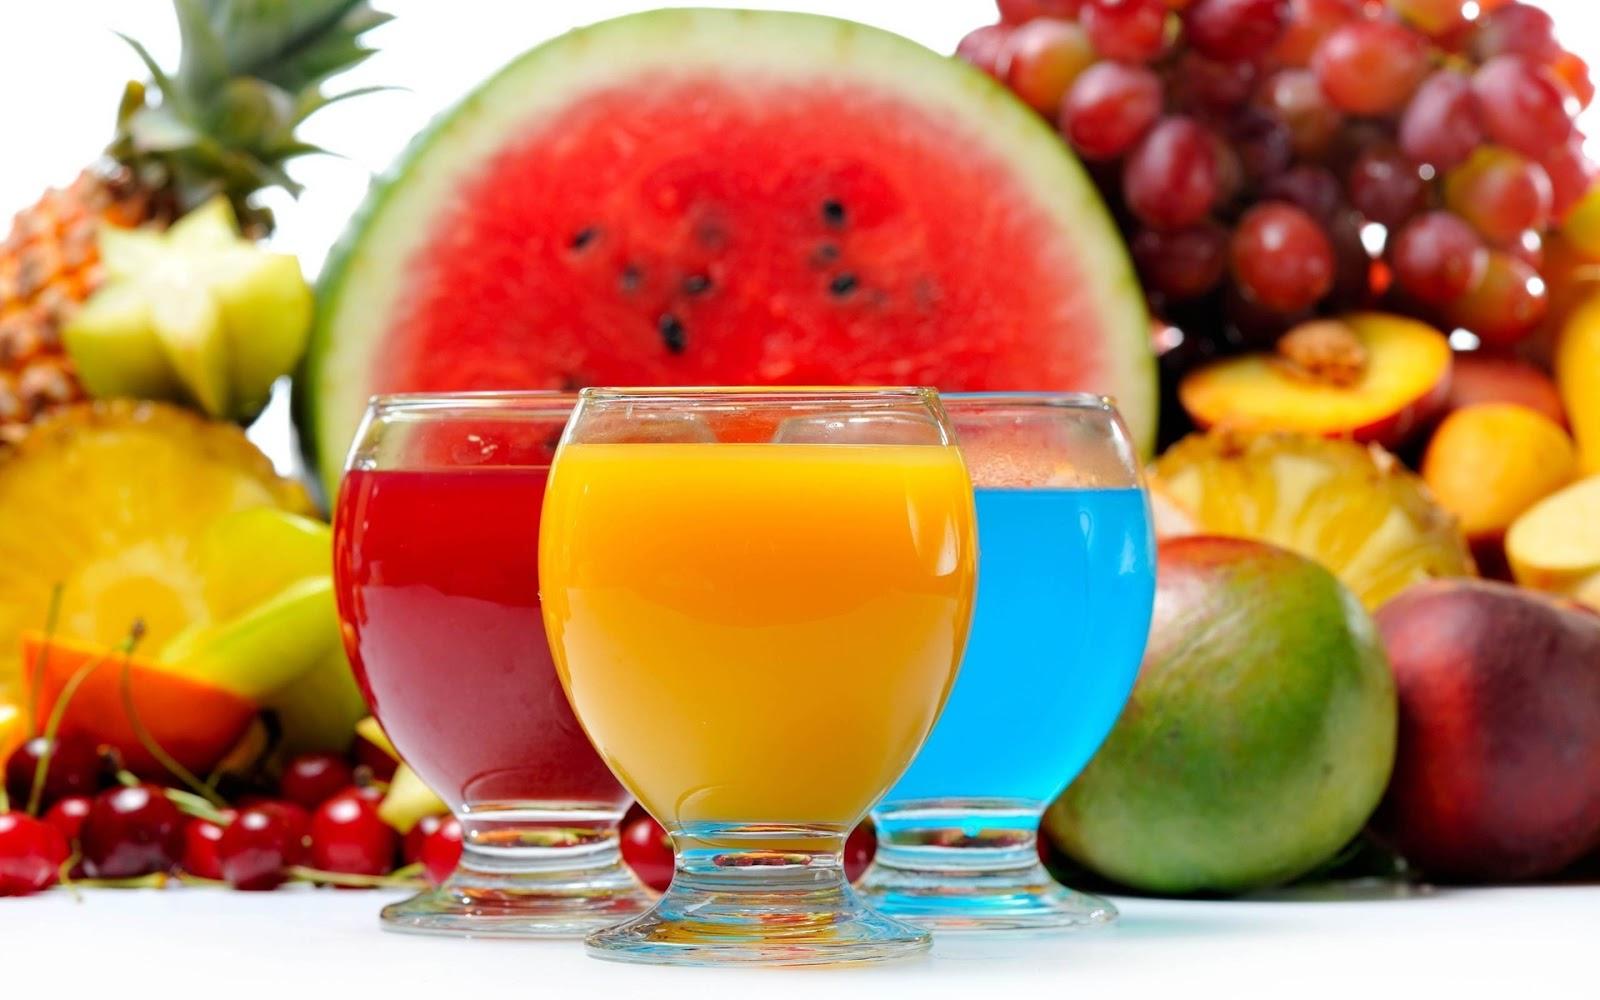 Healthy Food and Drink | Nulad Healthy